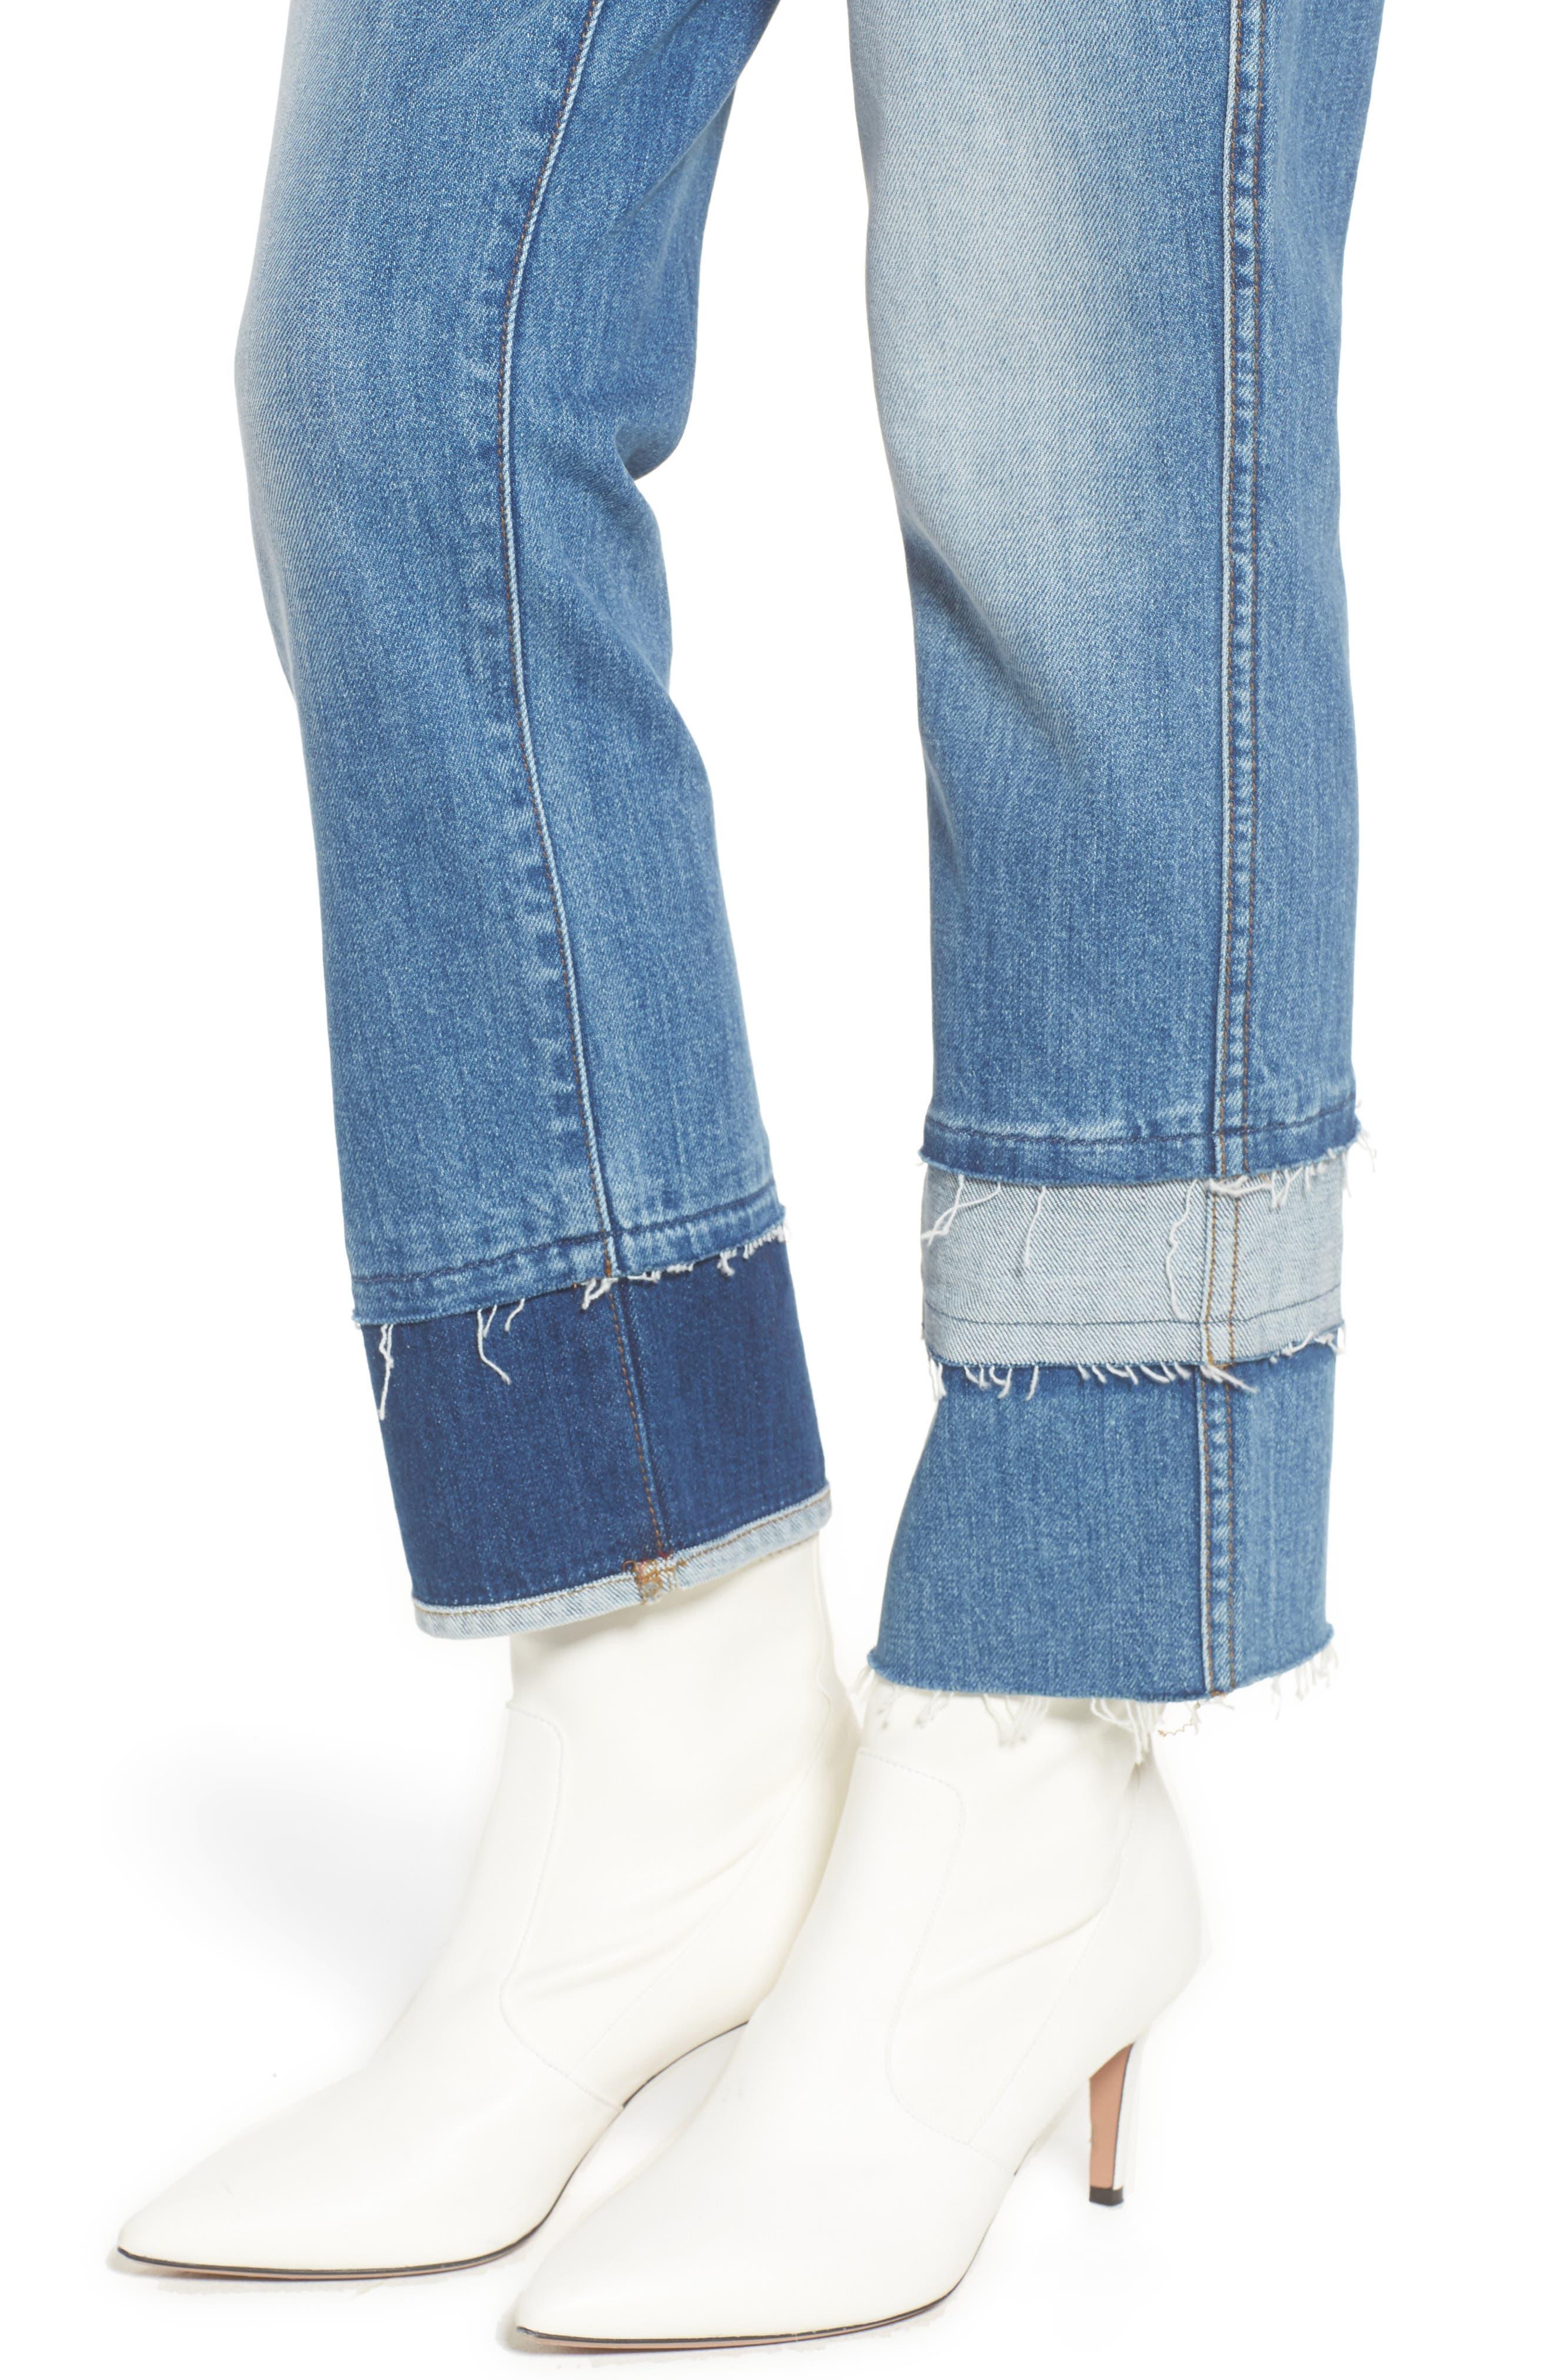 Edie Pieced Hem Cropped Jeans,                             Alternate thumbnail 4, color,                             Vintage Blue Dunes 2